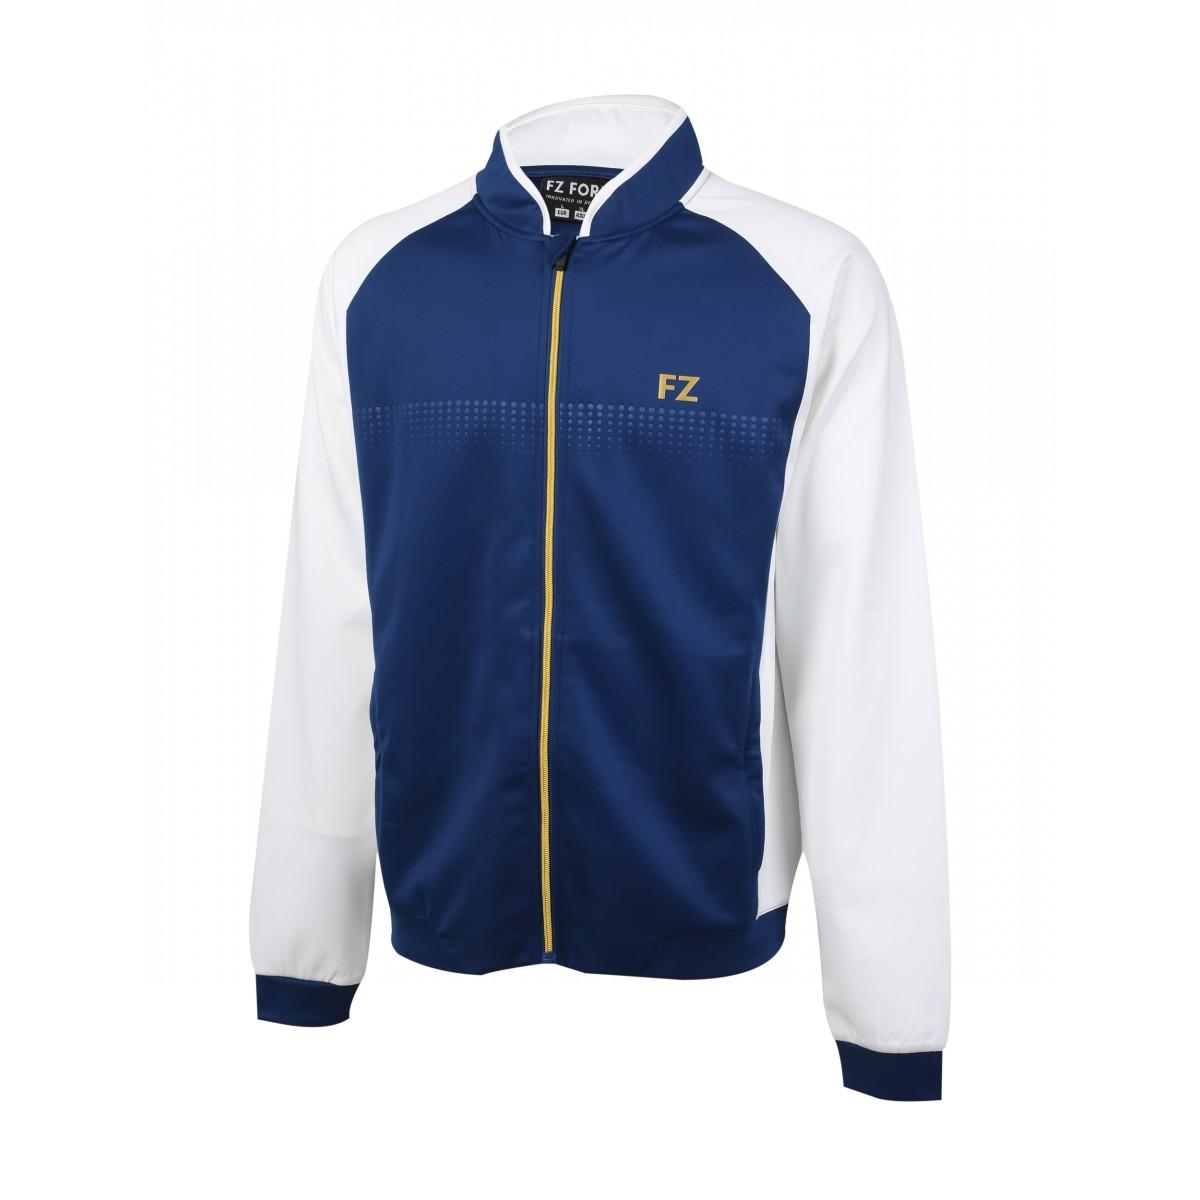 FZ Boston Jacket